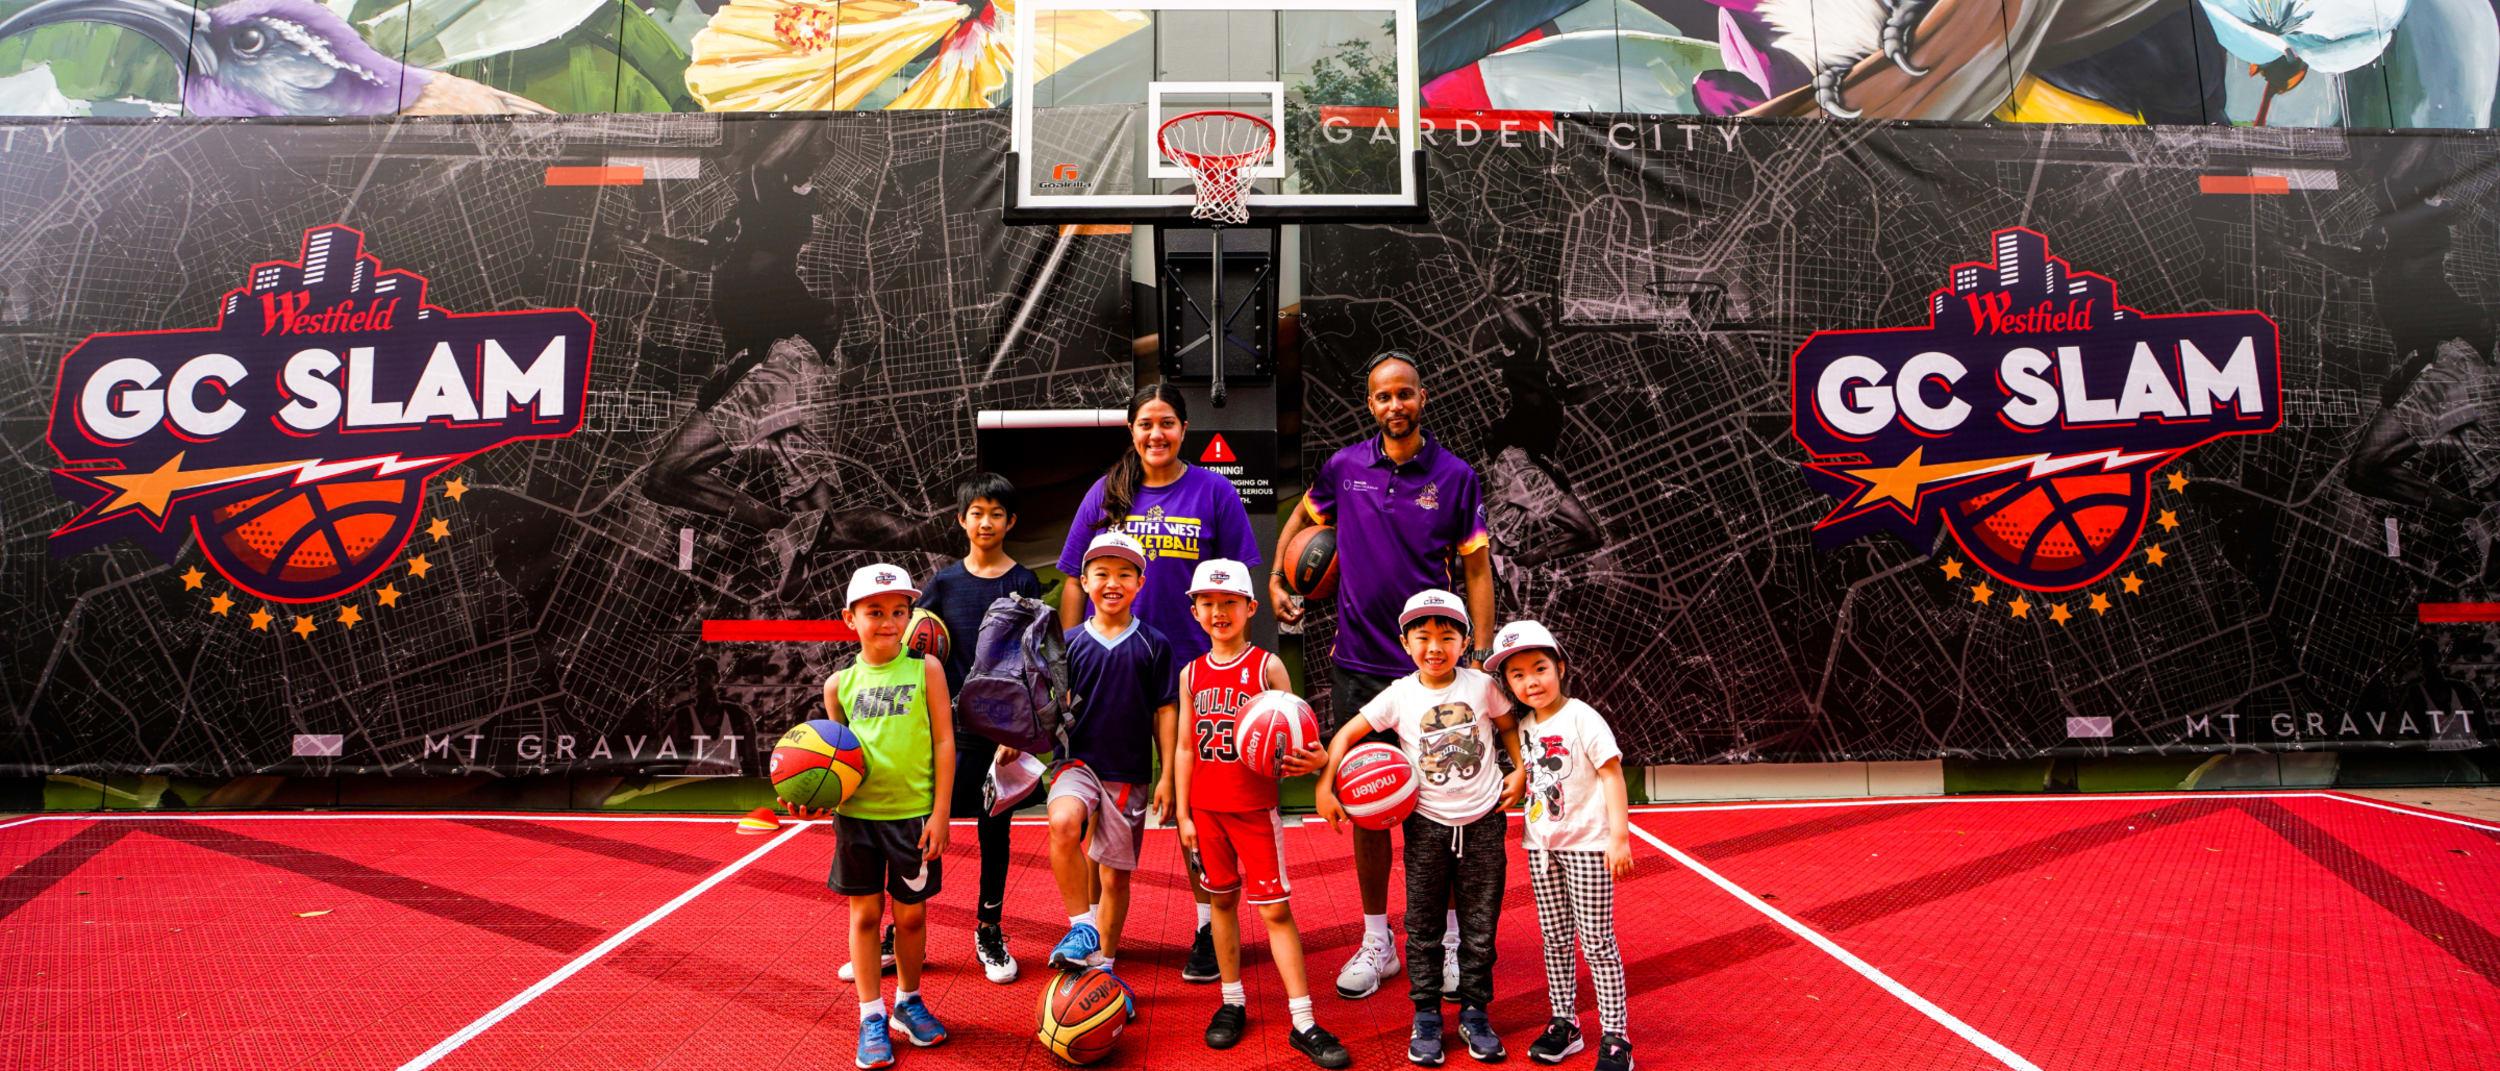 The GC Slam Basketball Court